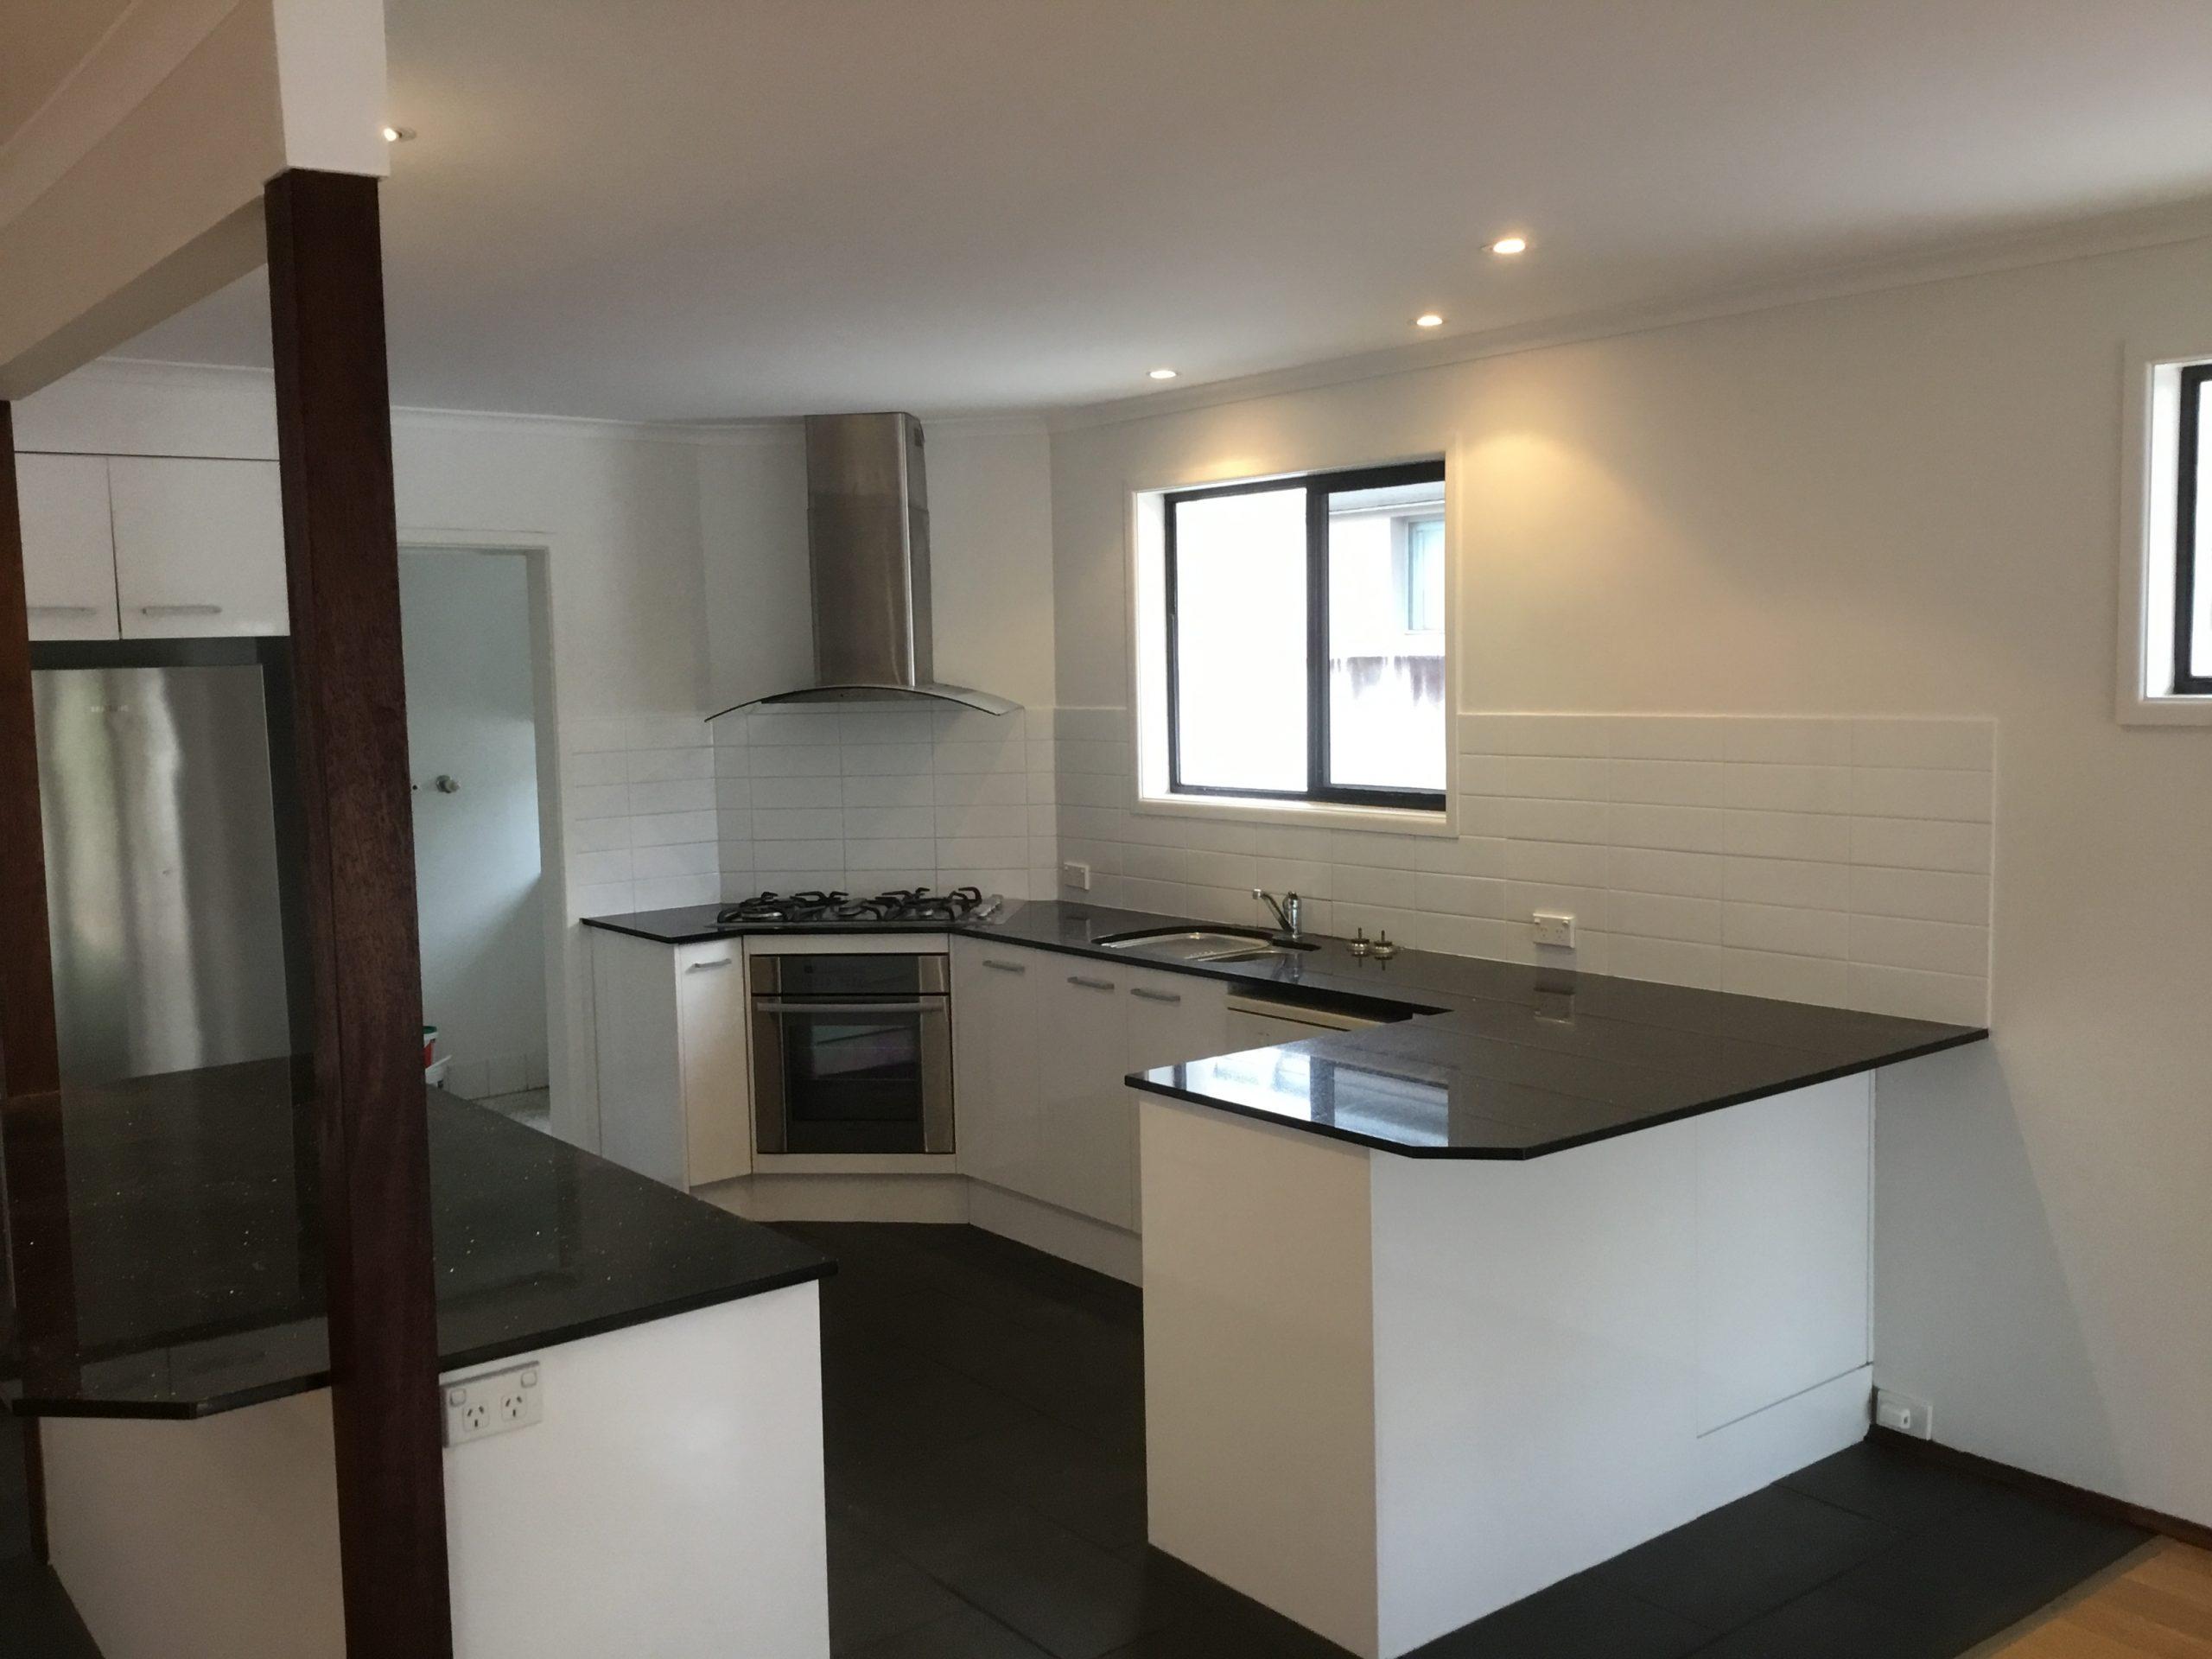 Real Estate | Gold Coast | Chevron Realty | Img 0129